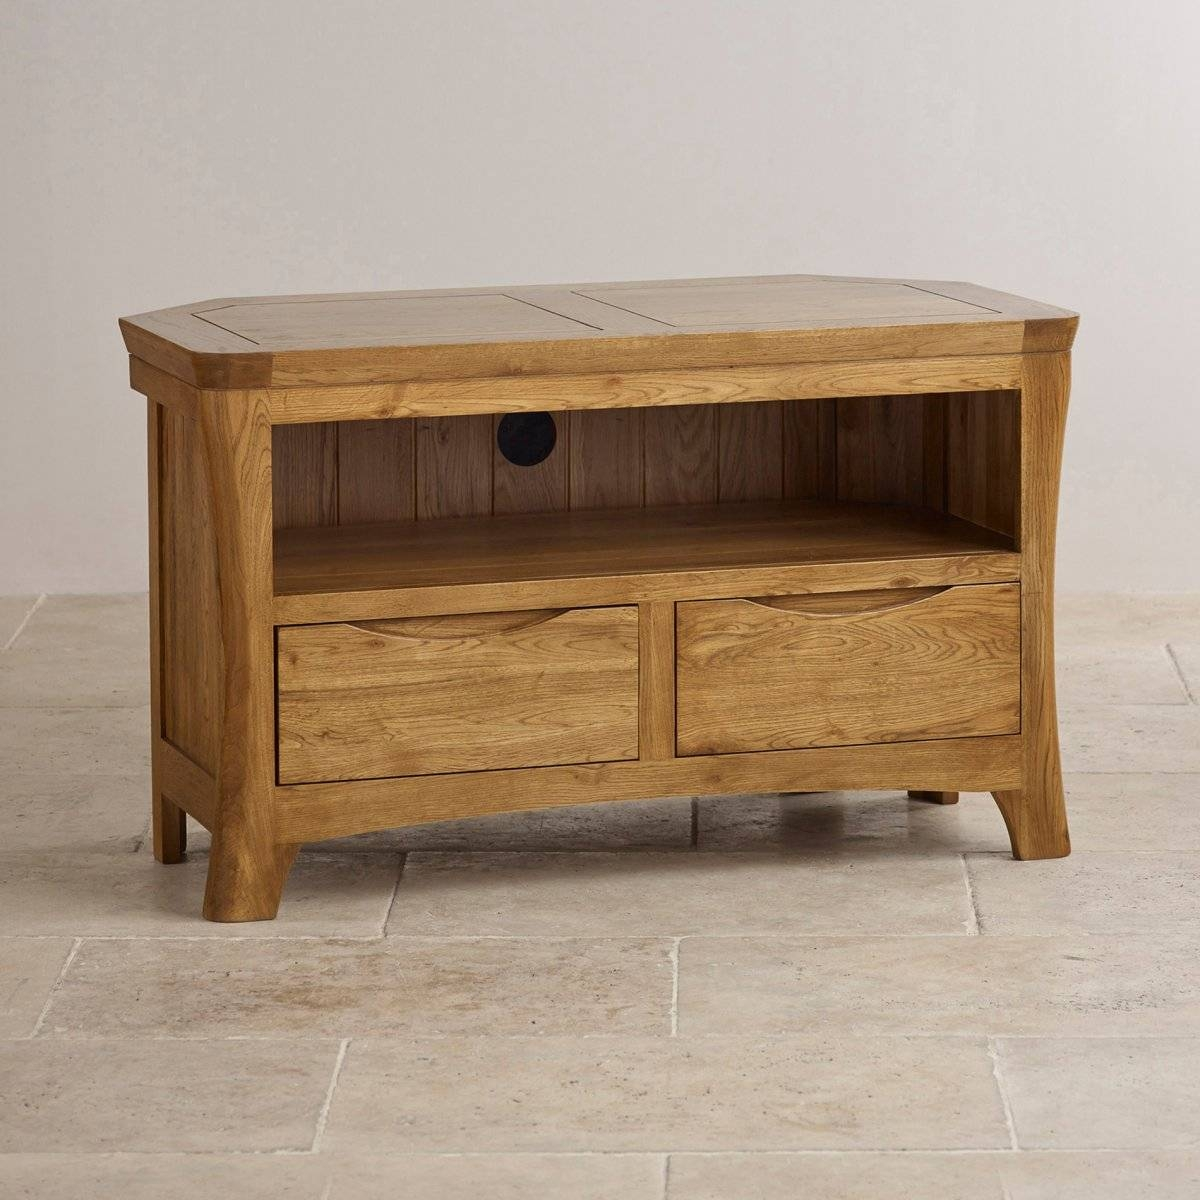 Orrick Corner Tv Cabinet In Rustic Oak | Oak Furniture Land throughout Rustic Tv Cabinets (Image 6 of 15)